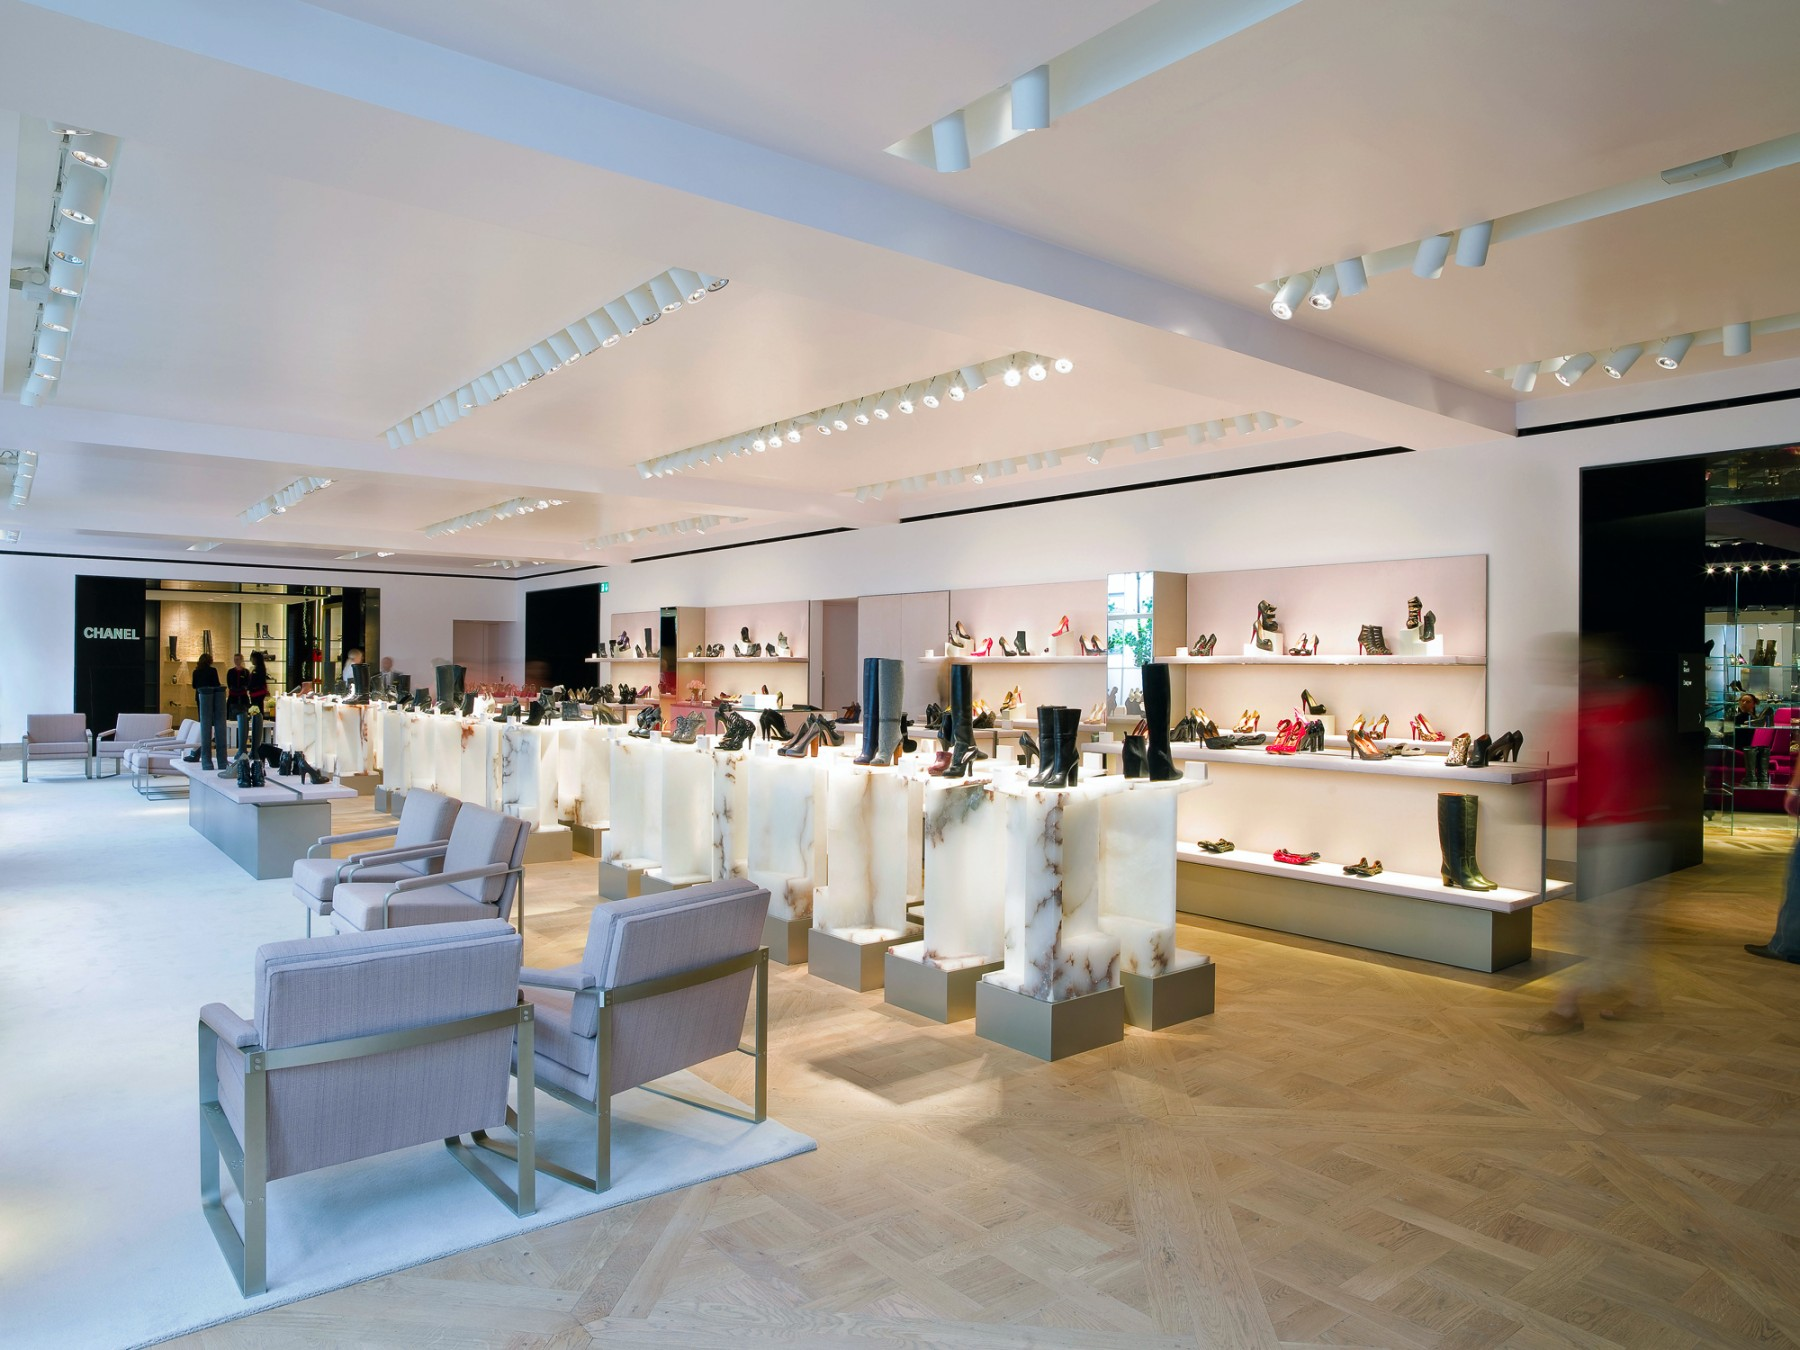 Selfridges-London-designer-fashion-retail-Jamie-Fobert-Architects-shoe-galleries-alabaster-plinths